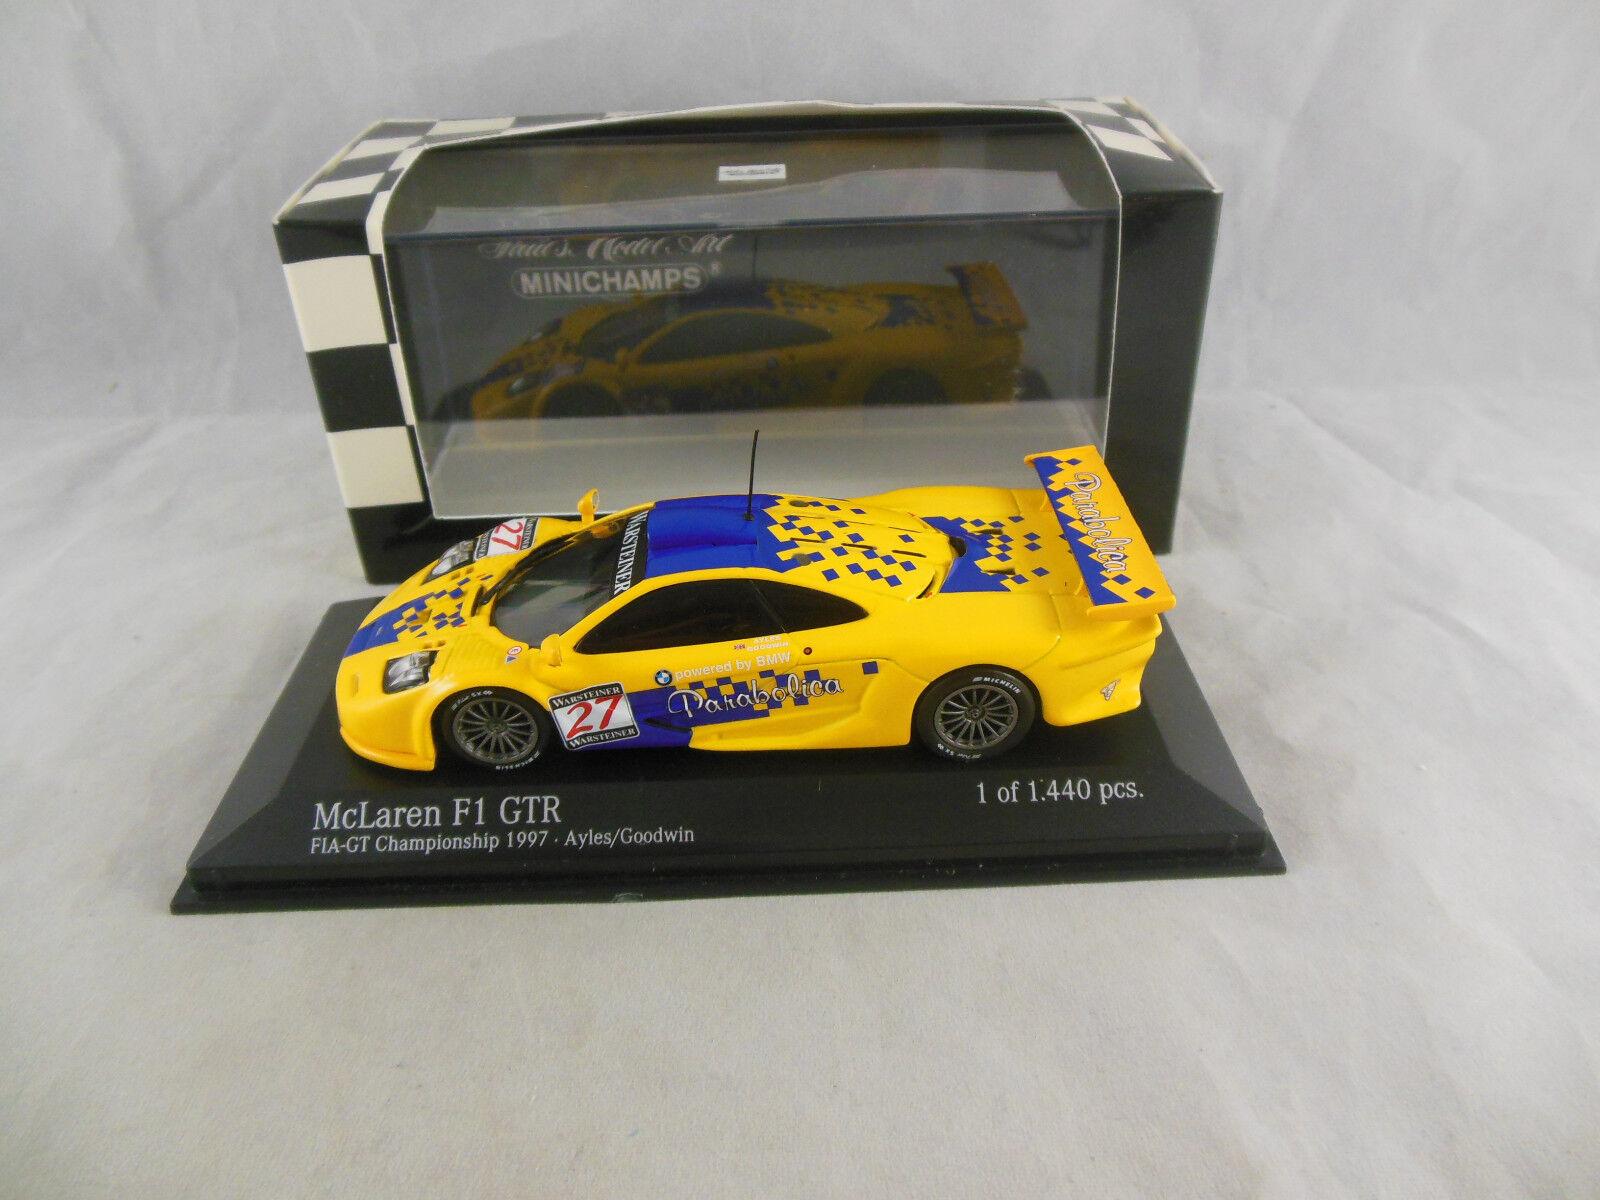 Minichamps 530 174327 Mclaren F1 GTR 1997 FIA GT Series Team Parabolica Ltd Ed.